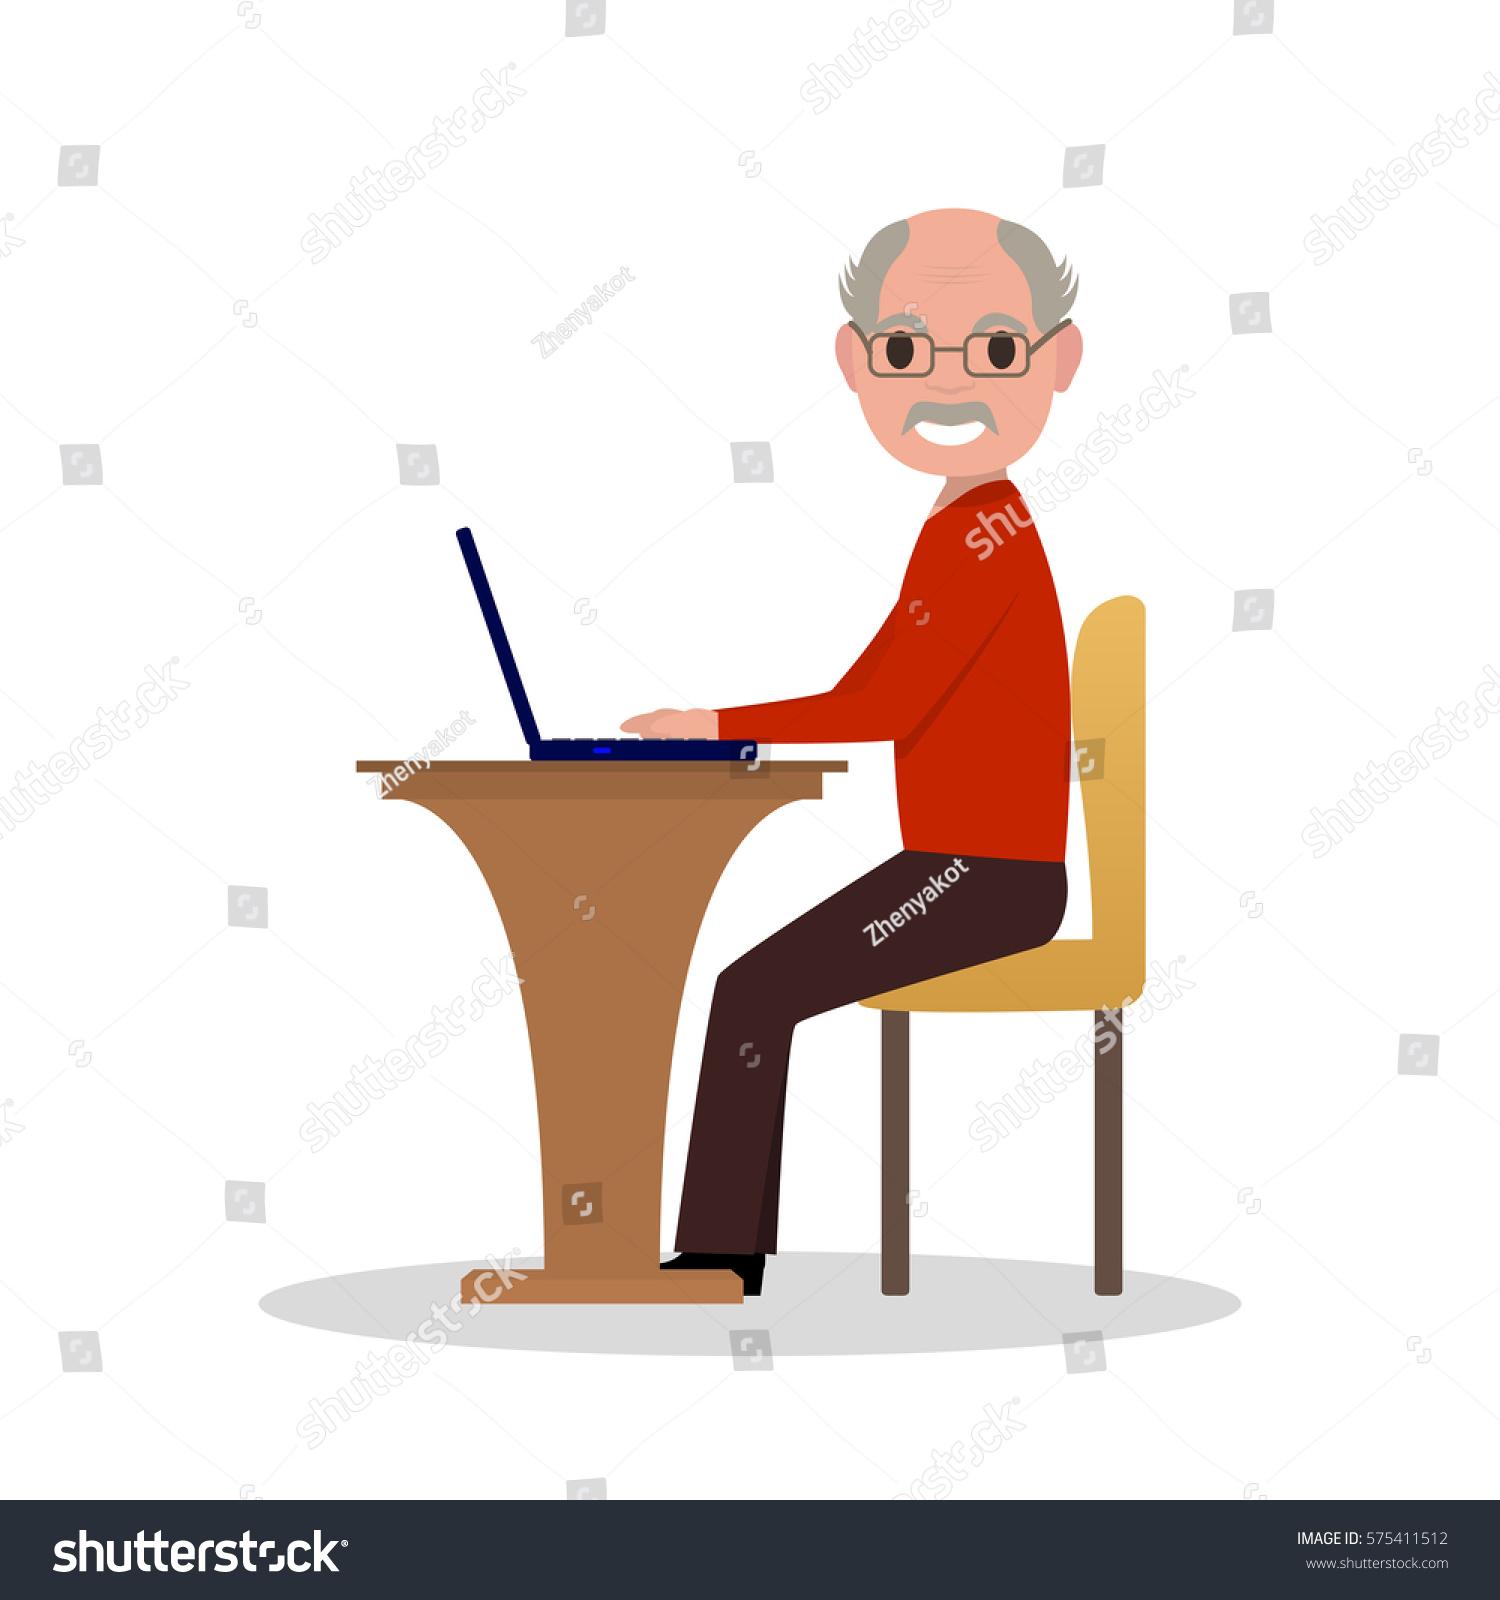 Vector Illustration Cartoon Old Man Sitting Stock Vector ...